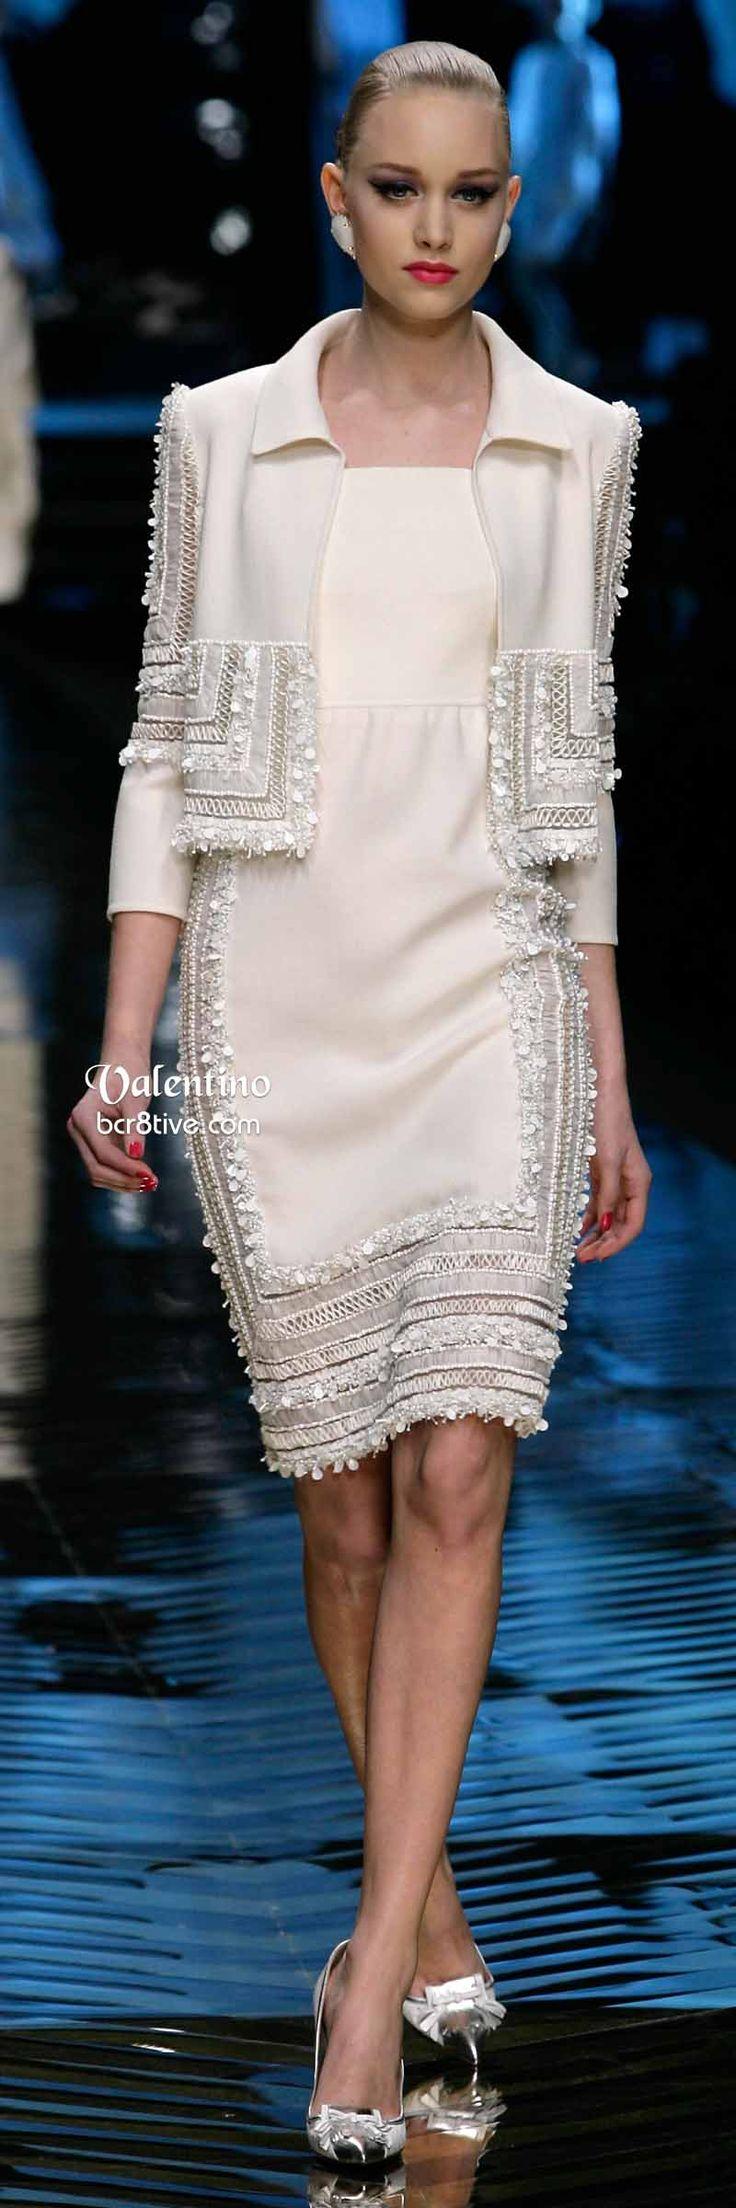 Valentino Formal Dress & Jacket